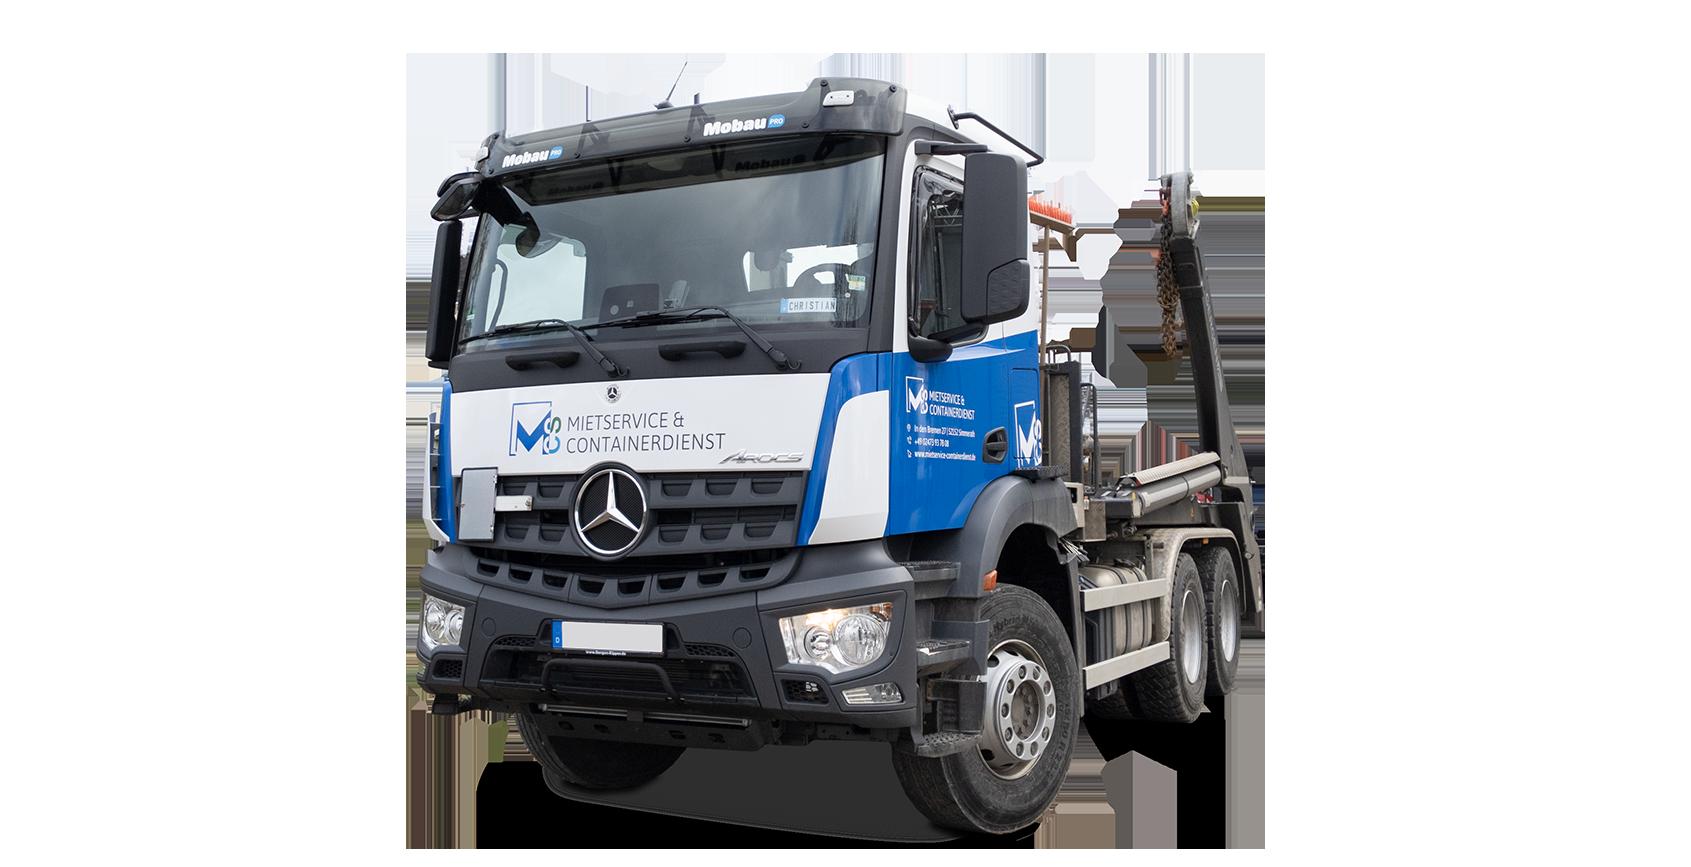 Containerdienst LKW - Flotte